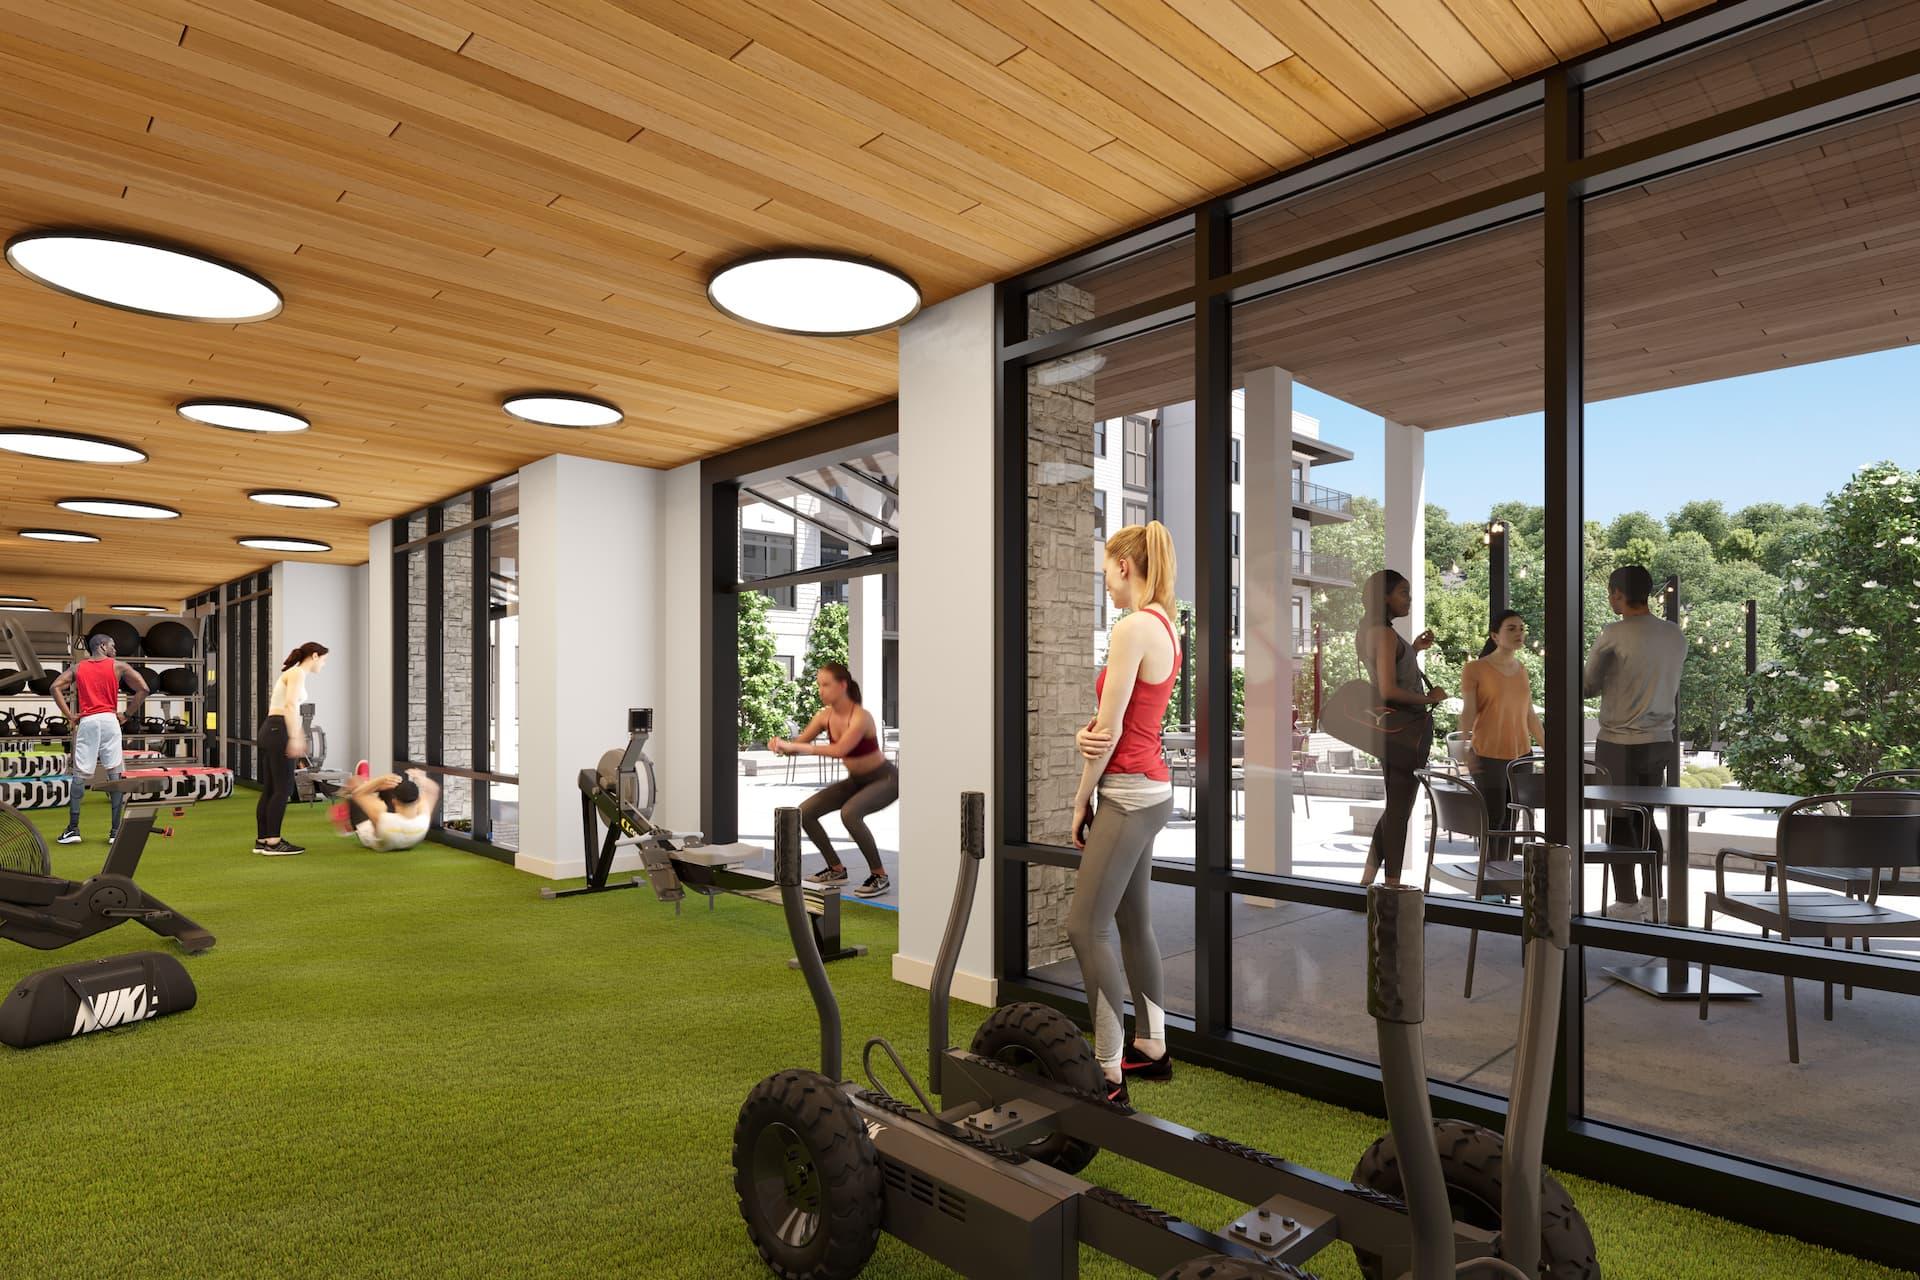 Wrenstone's large fitness room